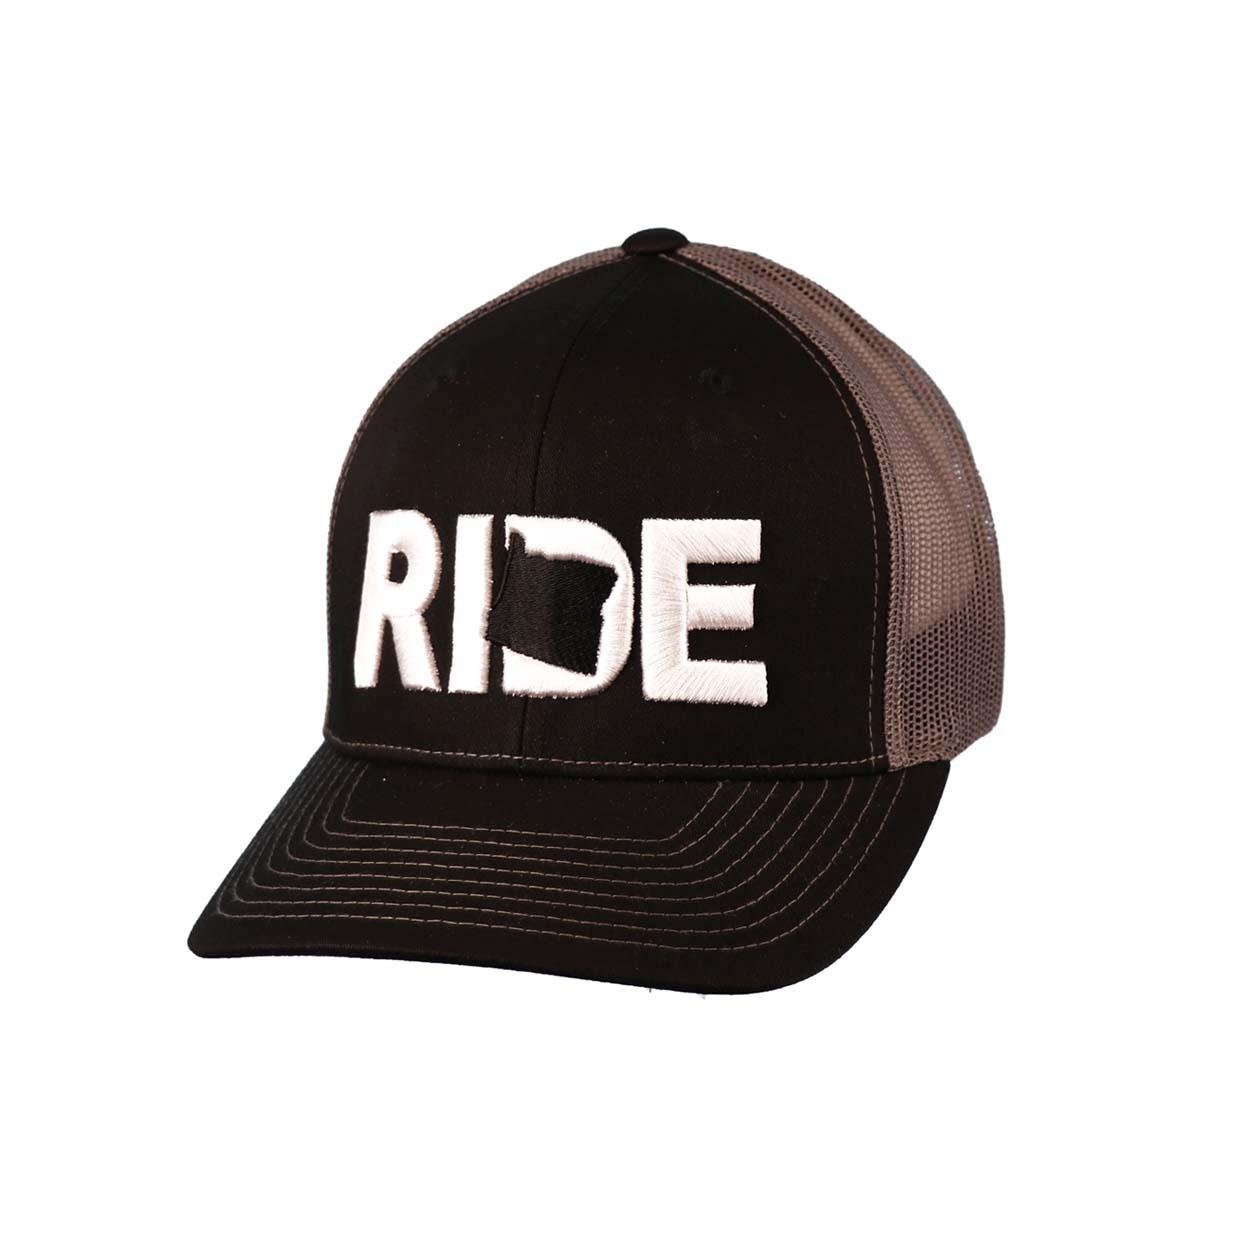 Ride Oregon Classic Embroidered Snapback Trucker Hat Black/White